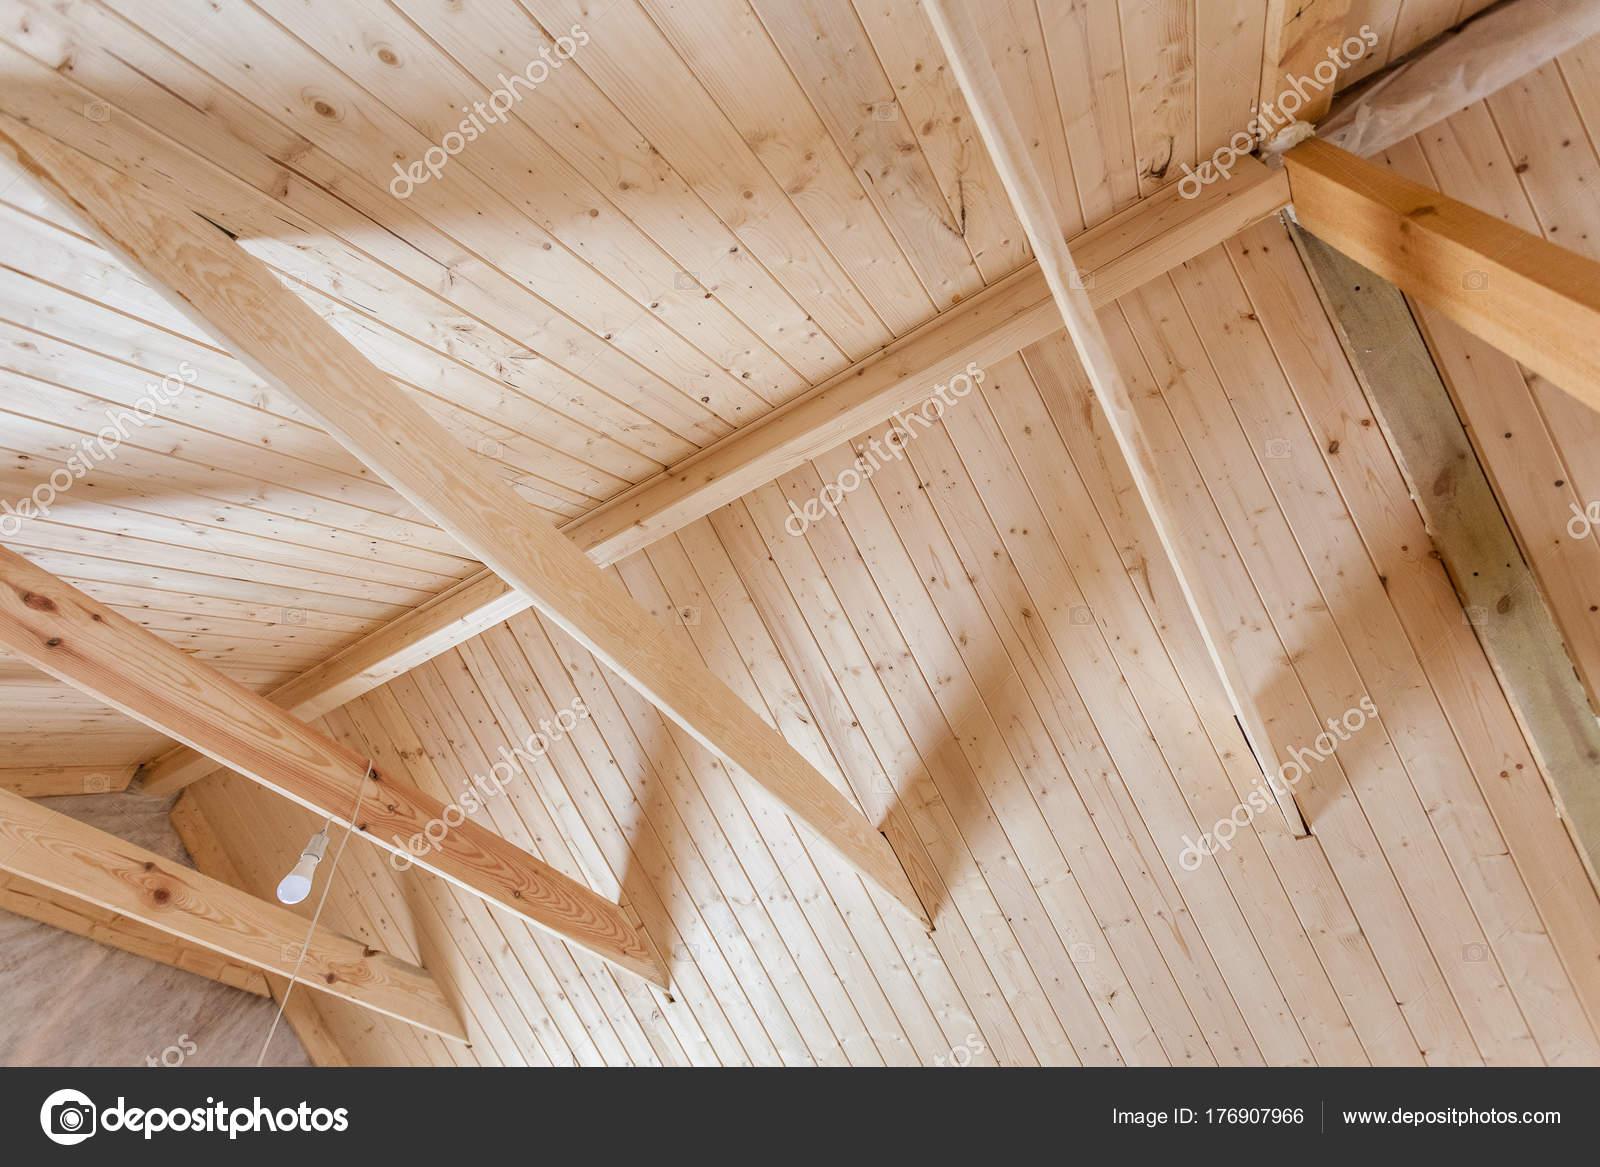 Turbo Dachgeschoss, Decke mit Holz Brett — Stockfoto © ivas76@mail.ru TG62